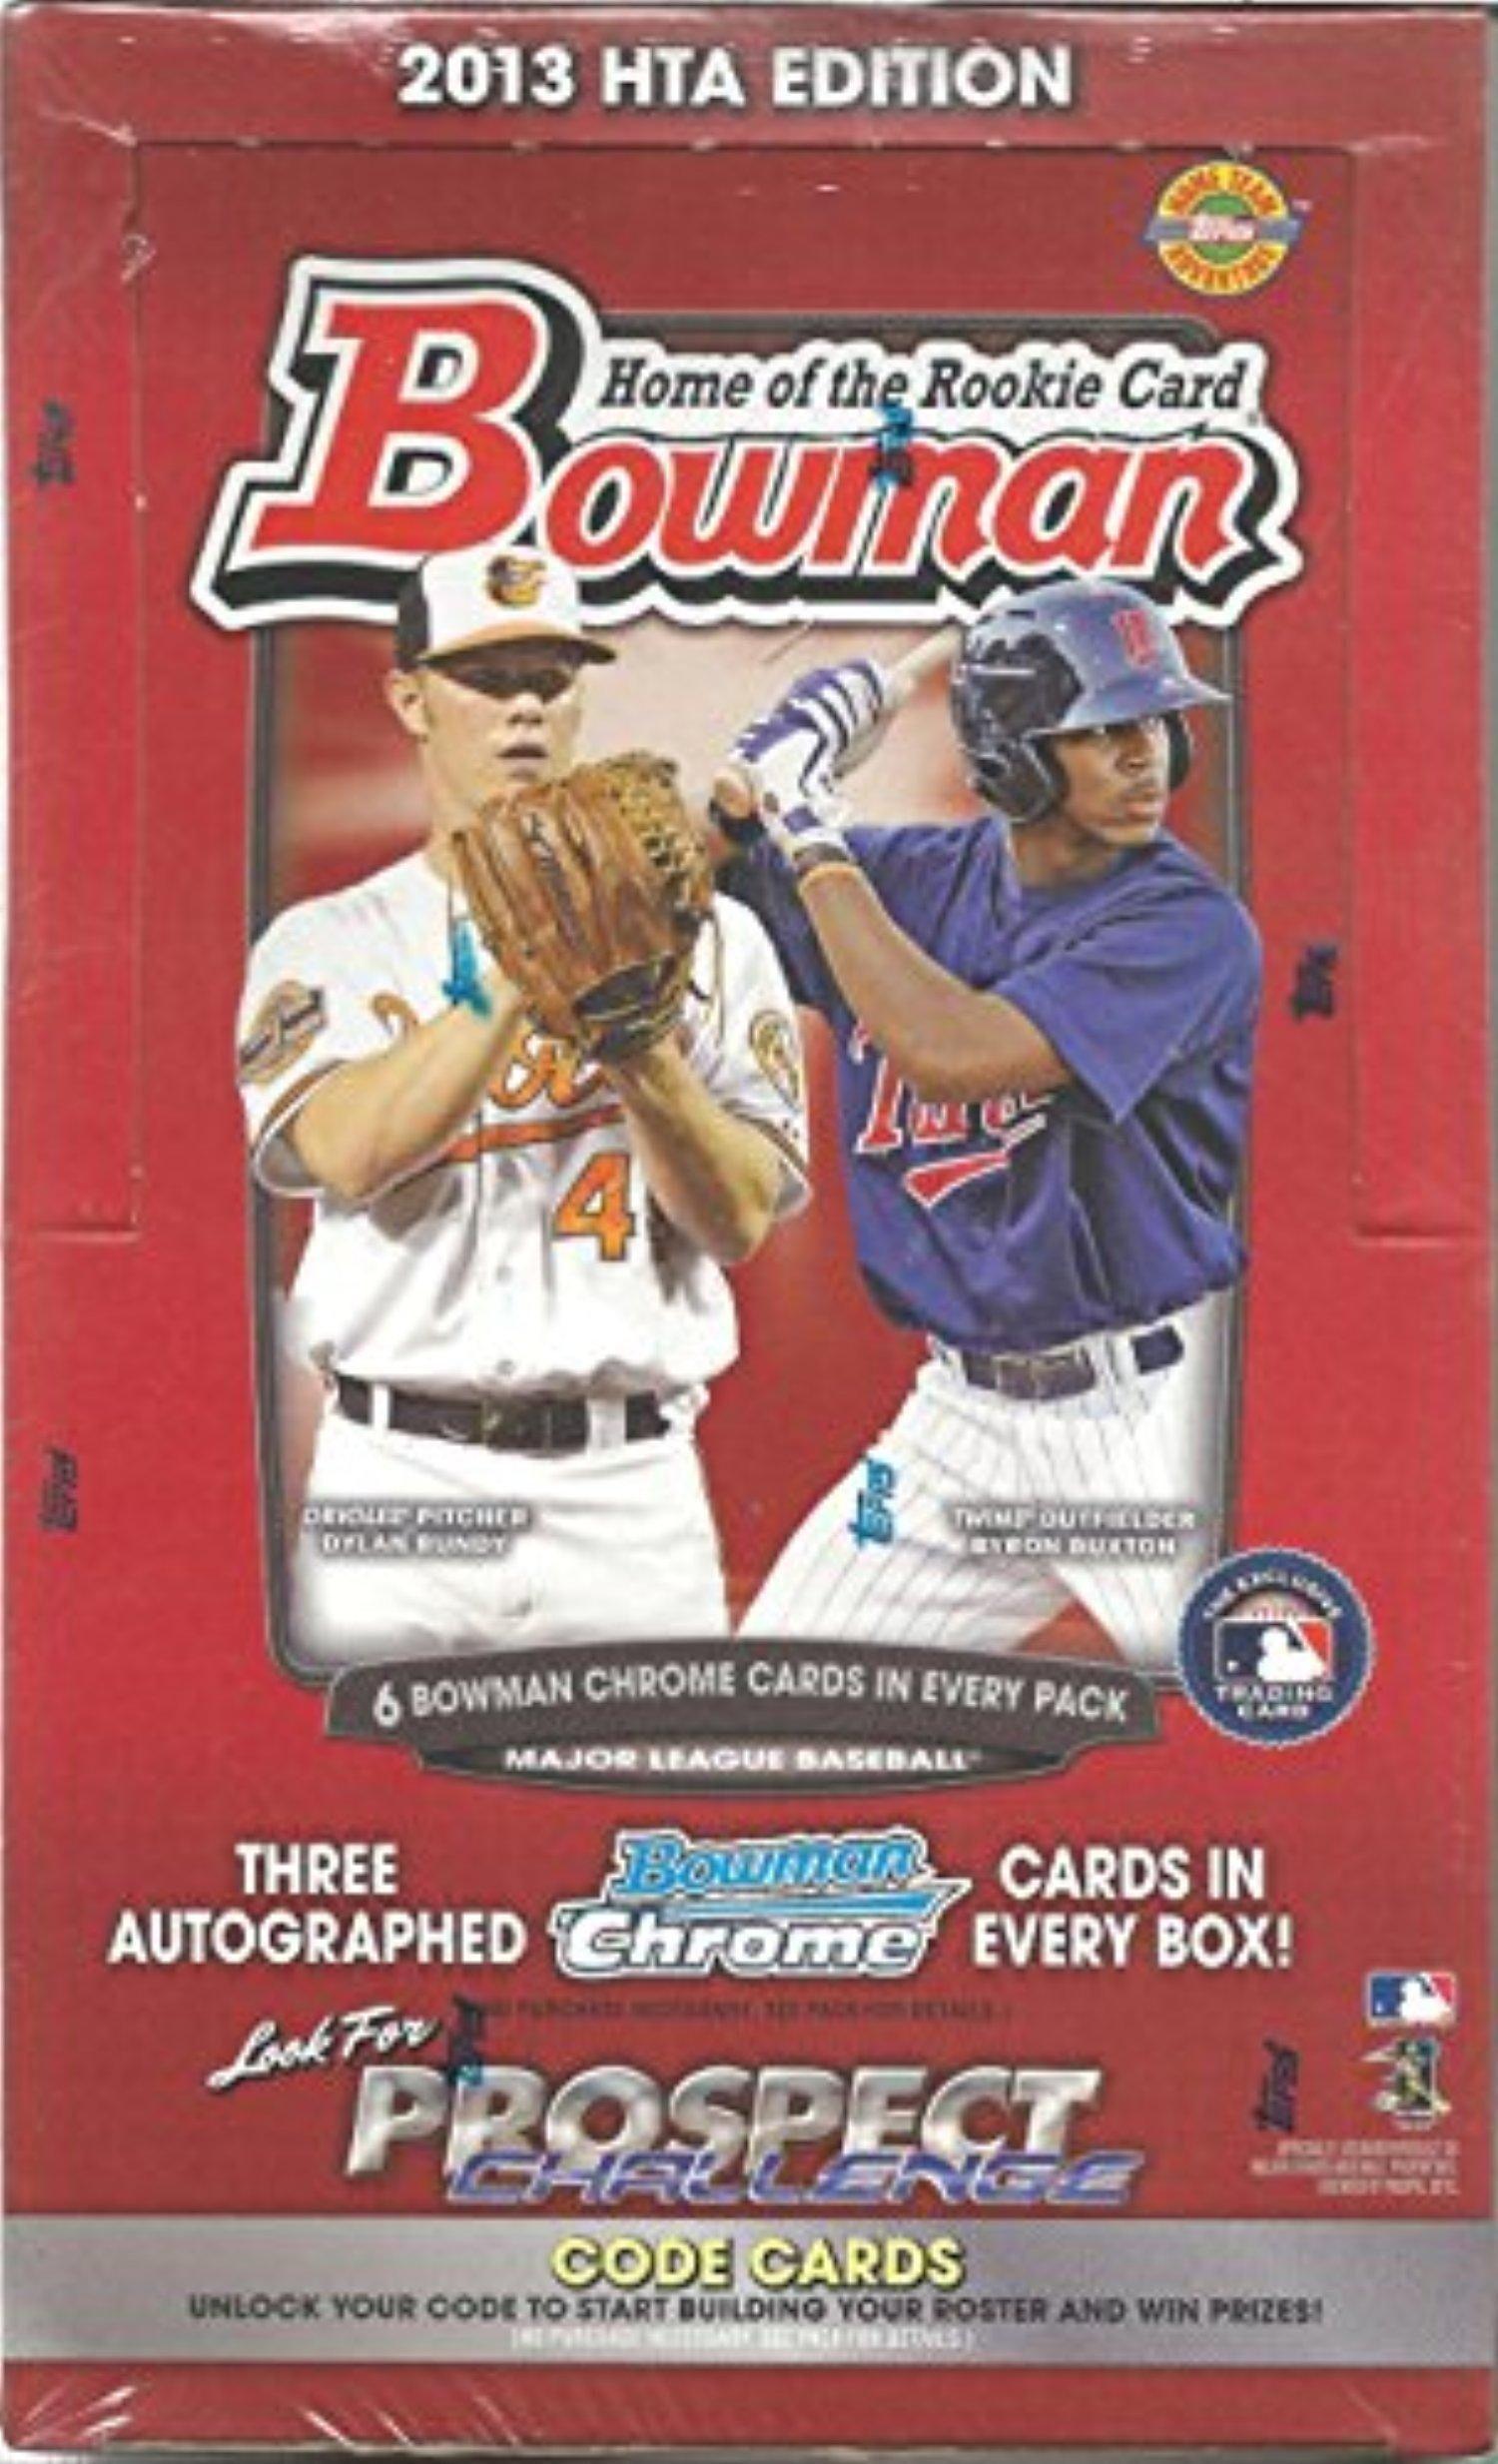 2013 bowman baseball sealed jumbo box of 12 packs 3 bowman